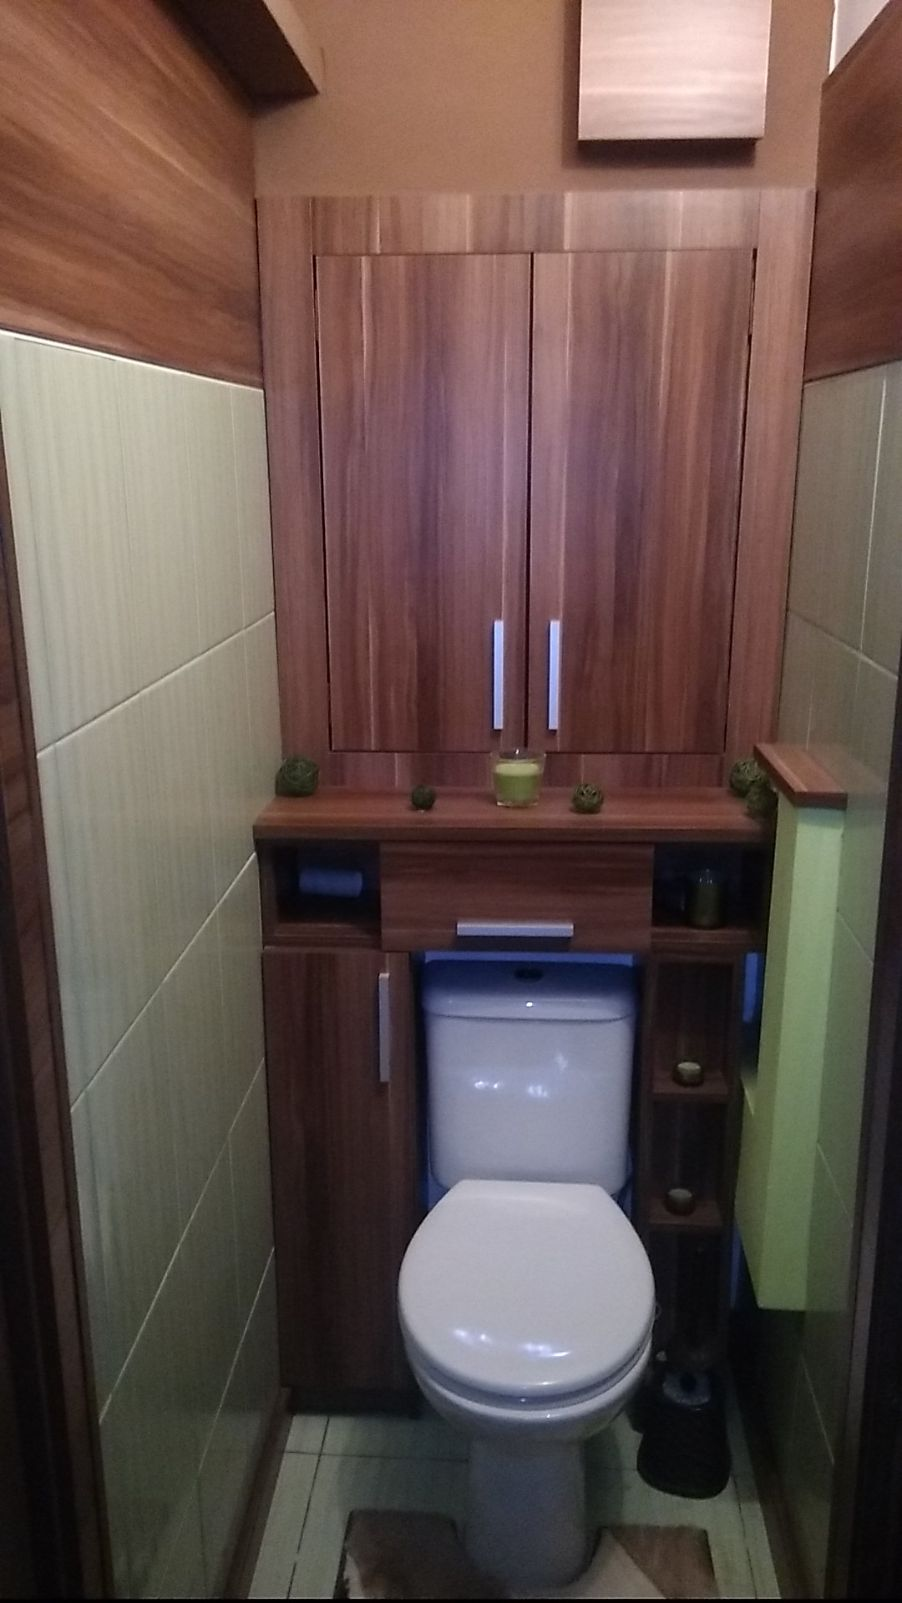 Nábytok do wc